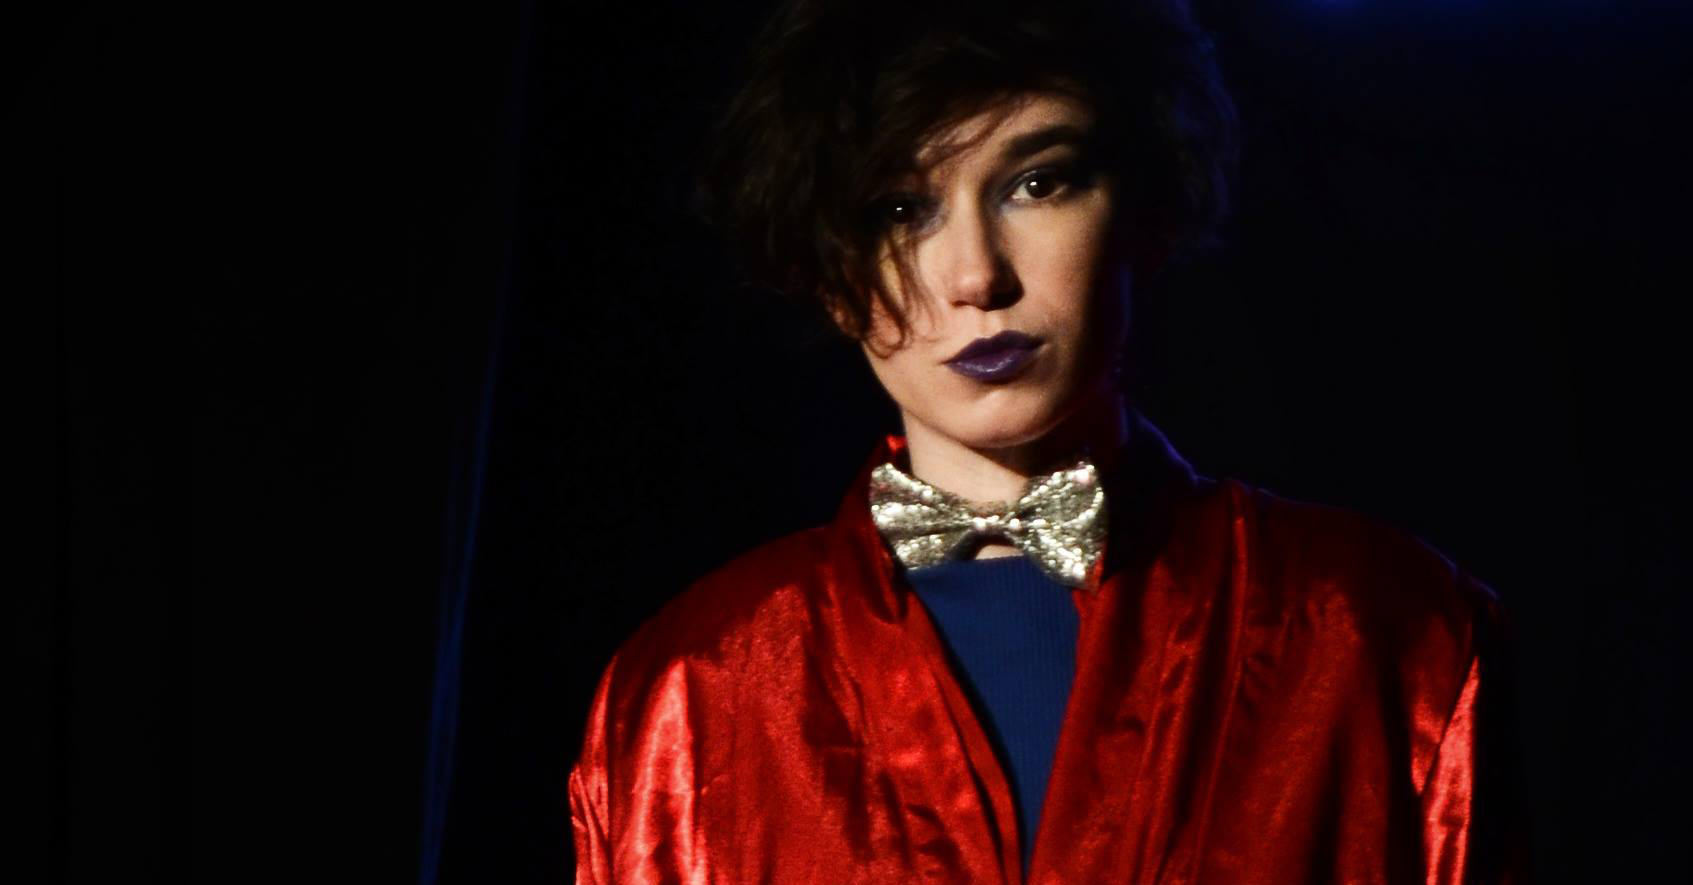 Alexa Rosenberg as Prince Orlofsky from OperaRox's Opera Rave Masquerade at the Stonewall Inn (photo credit Heather Bobeck)